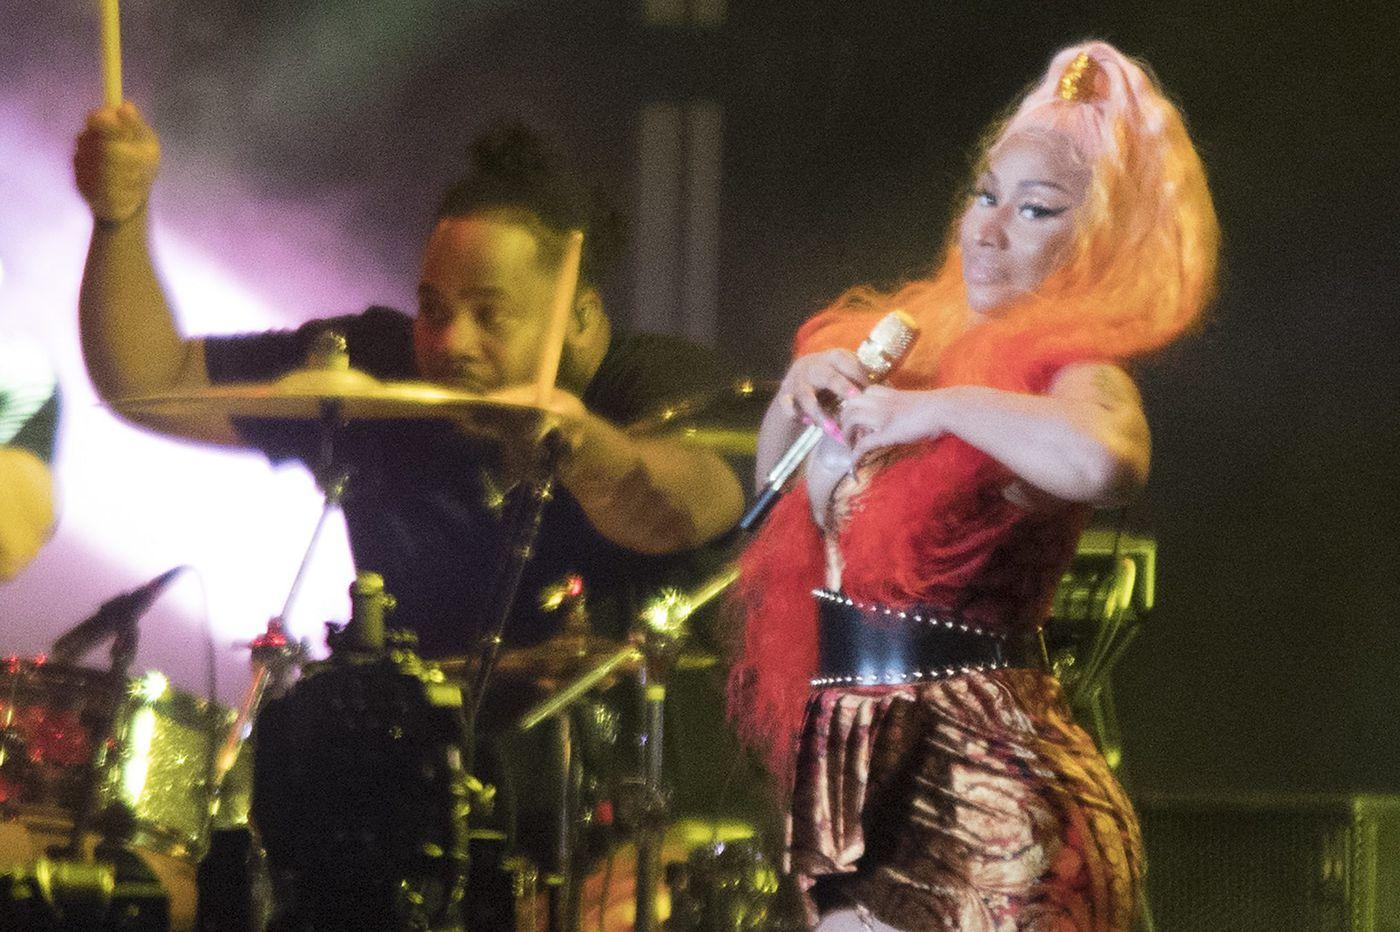 Made in America: Kendrick Lamar's set makes the festival great, Nicki Minaj underwhelms